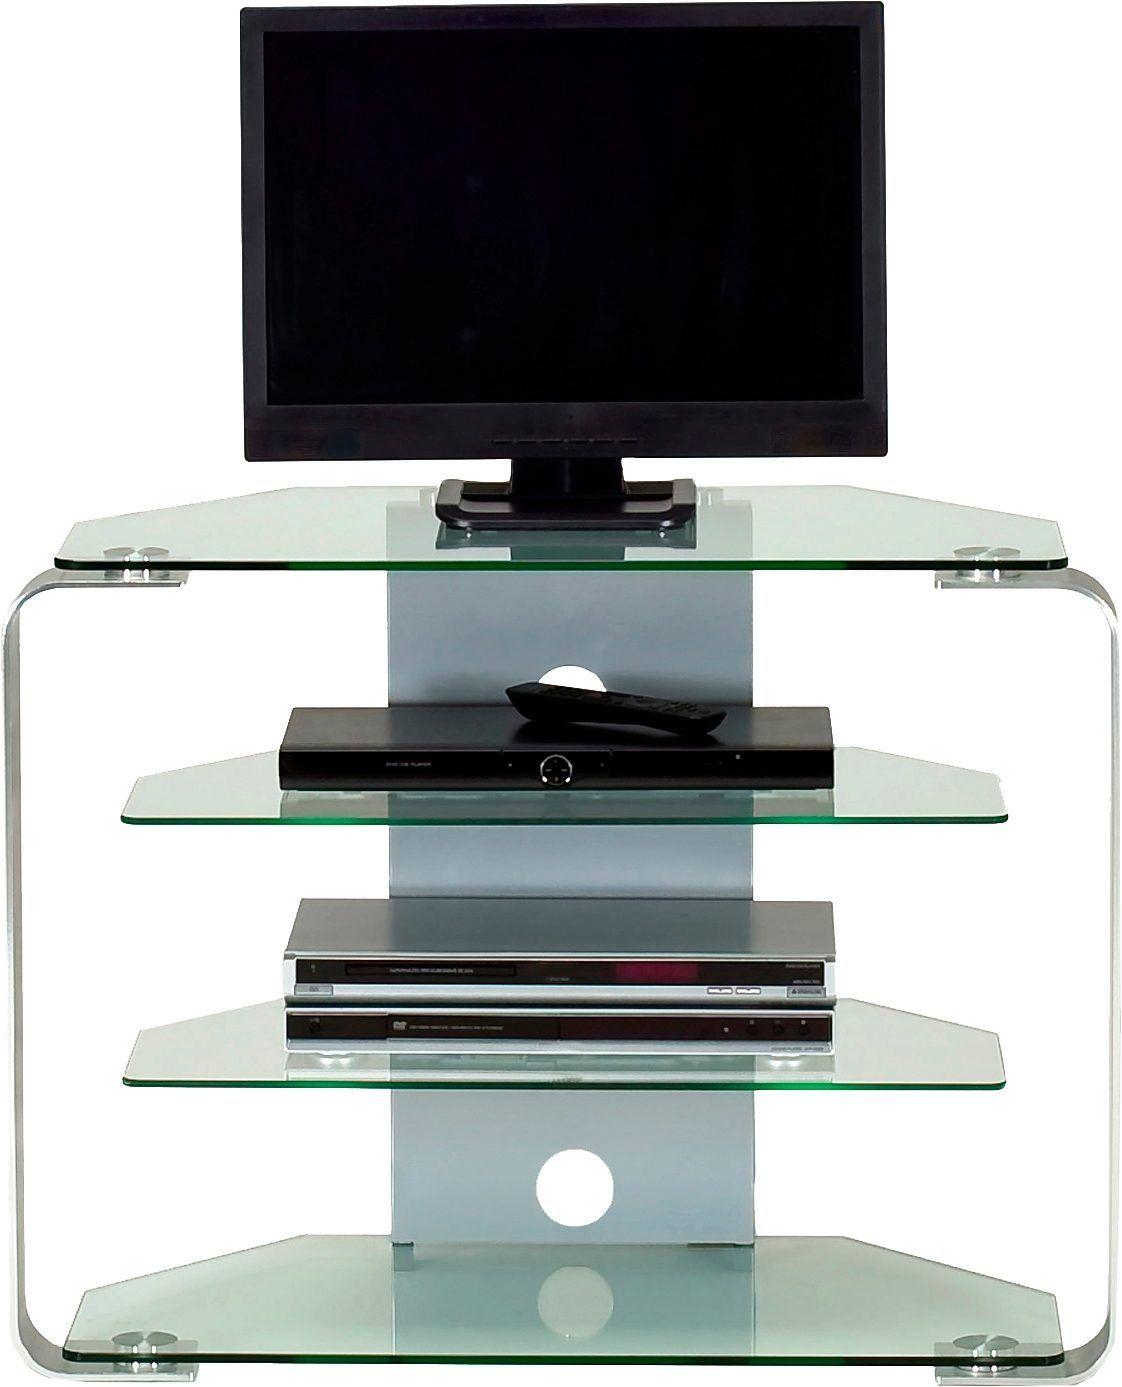 jahnke tv mobel Jahnke Eck-LCD-TV-Möbel »CU-MR 100 LED« weiß